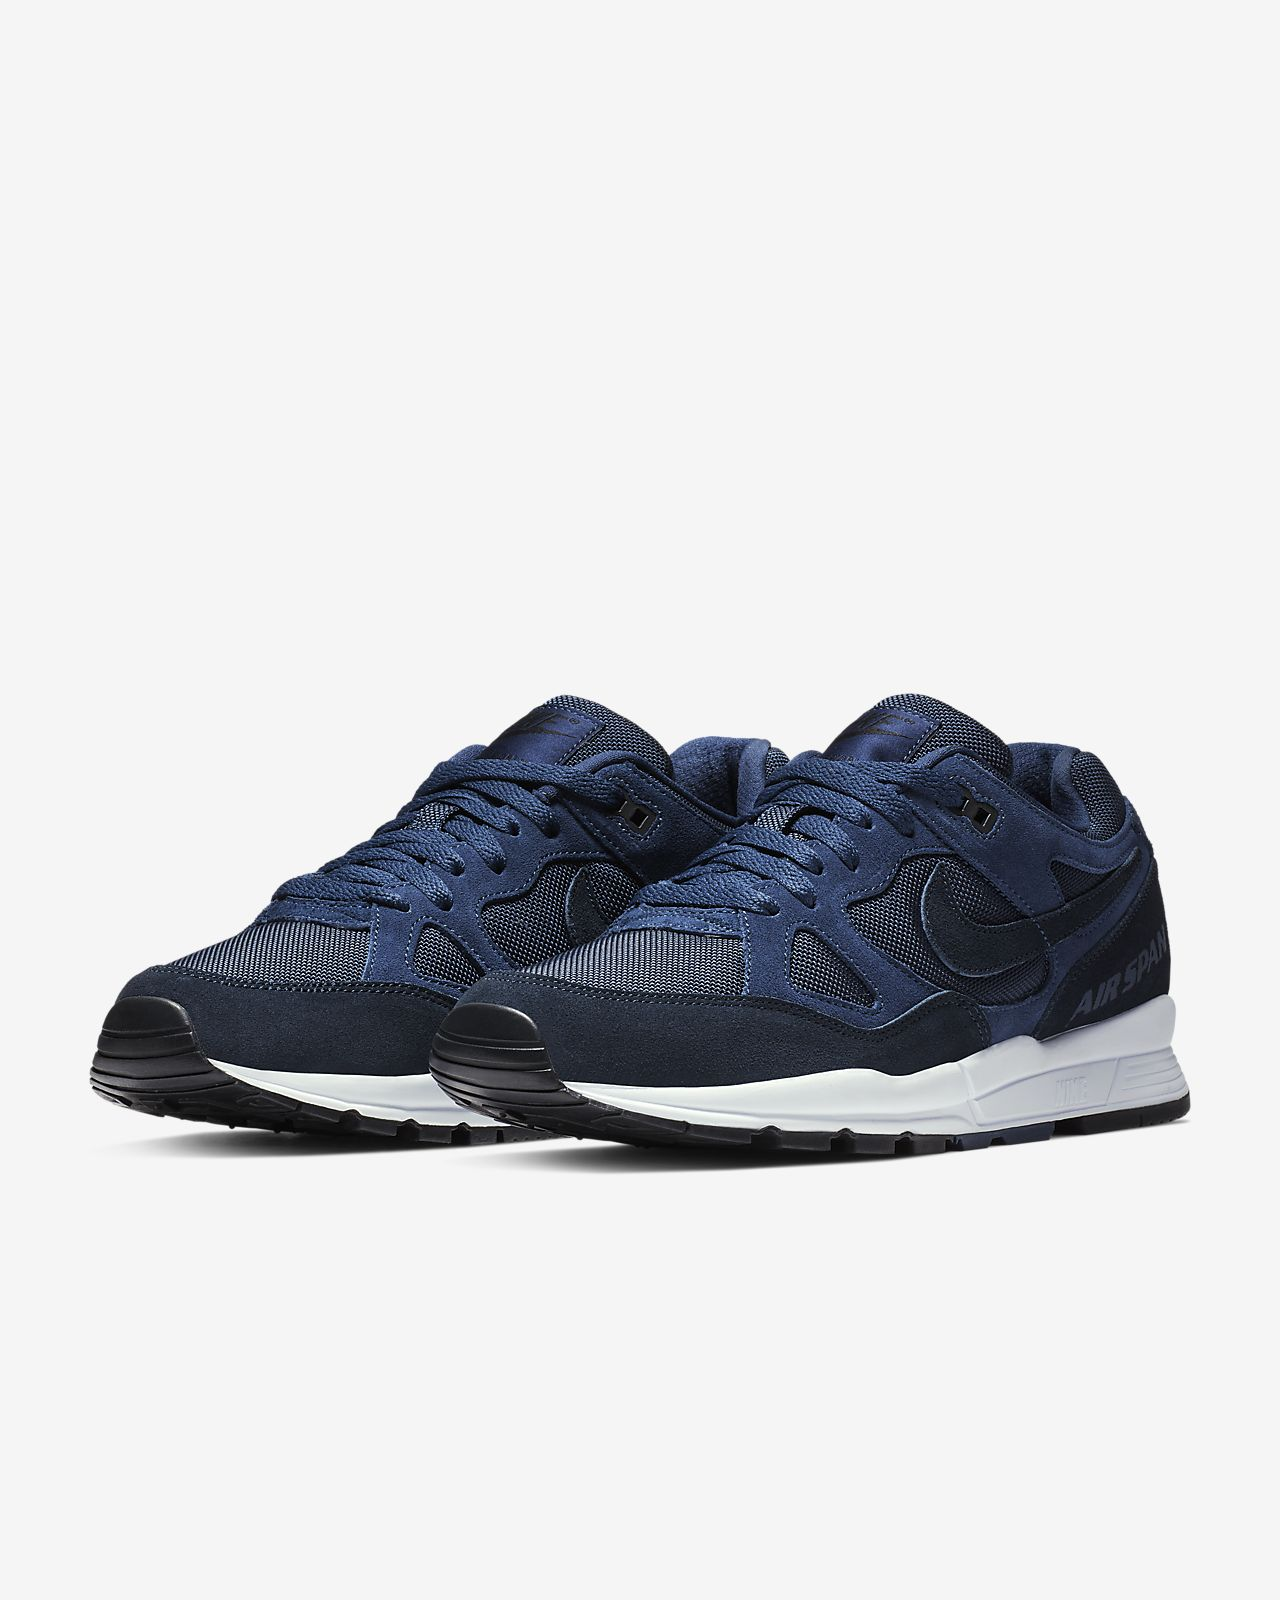 Chaussure Nike Air Span II SE pour Homme